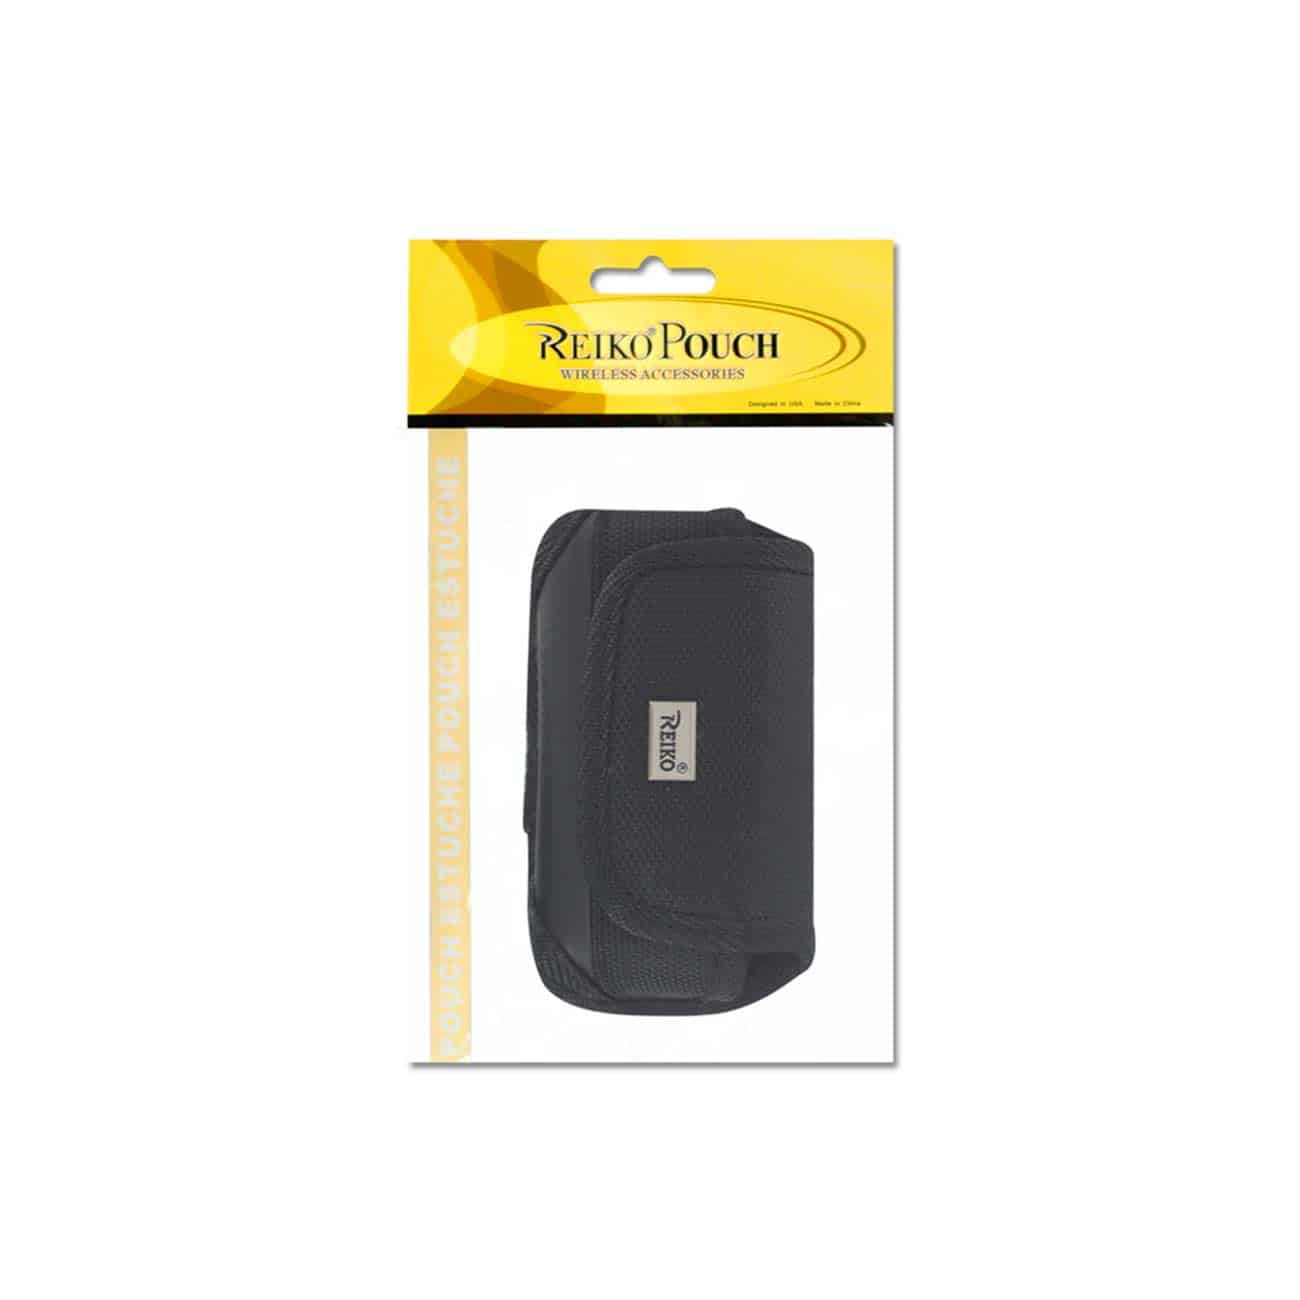 HORIZONTAL POUCH HP107 TREO650 BLACK 4.4X2.3X0.9 INCHES